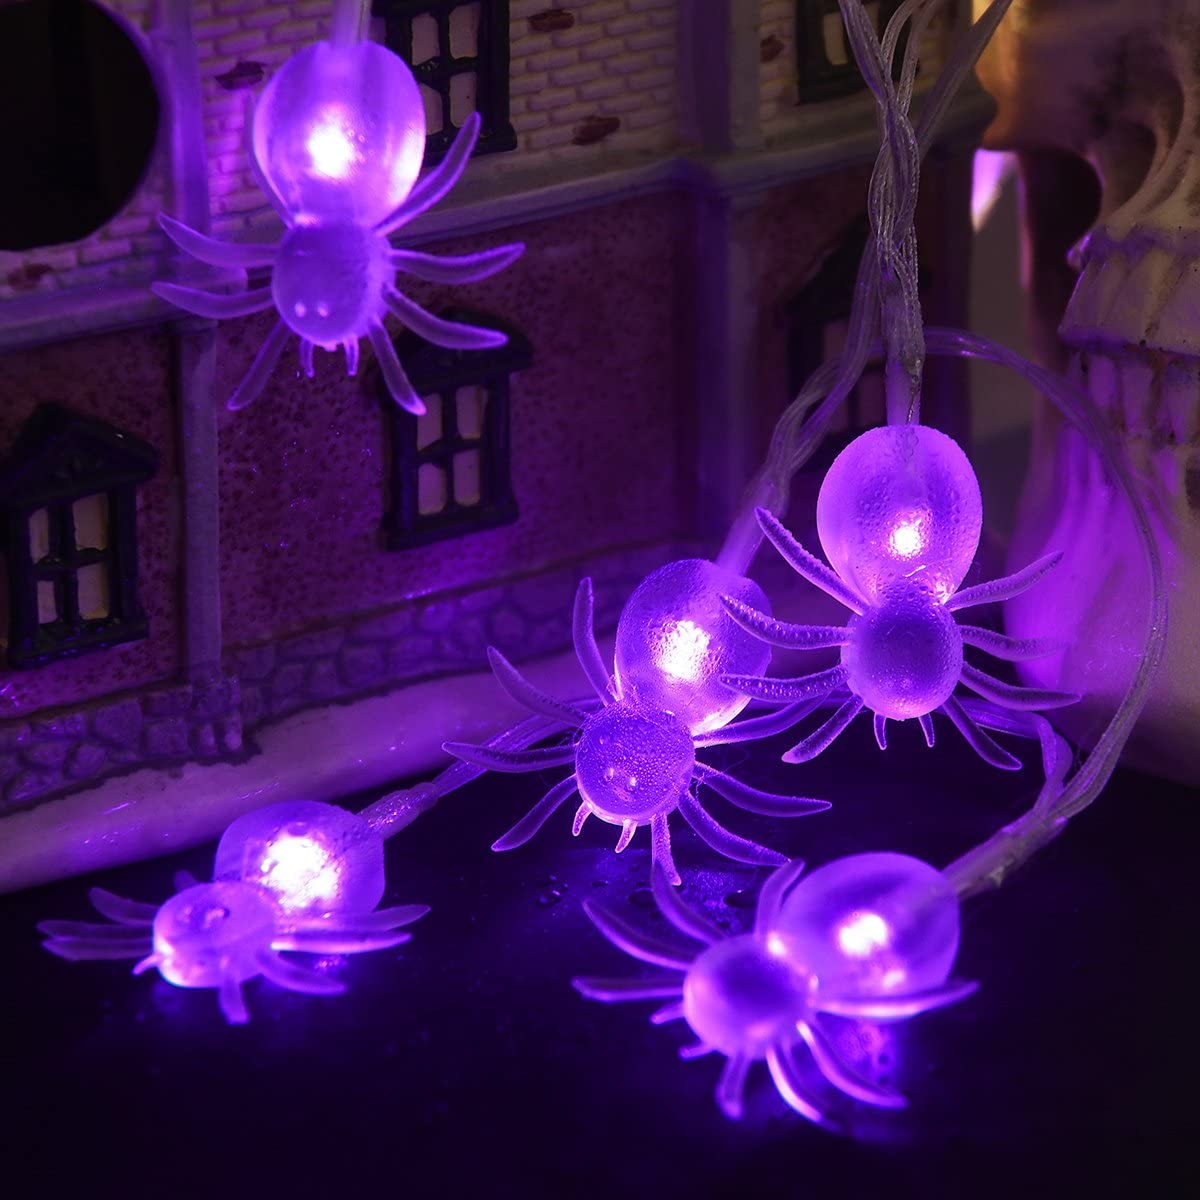 Halloween Spider String Lights, Waterproof 11.5ft LED Halloween String Lights for Halloween Decoration (Purple)